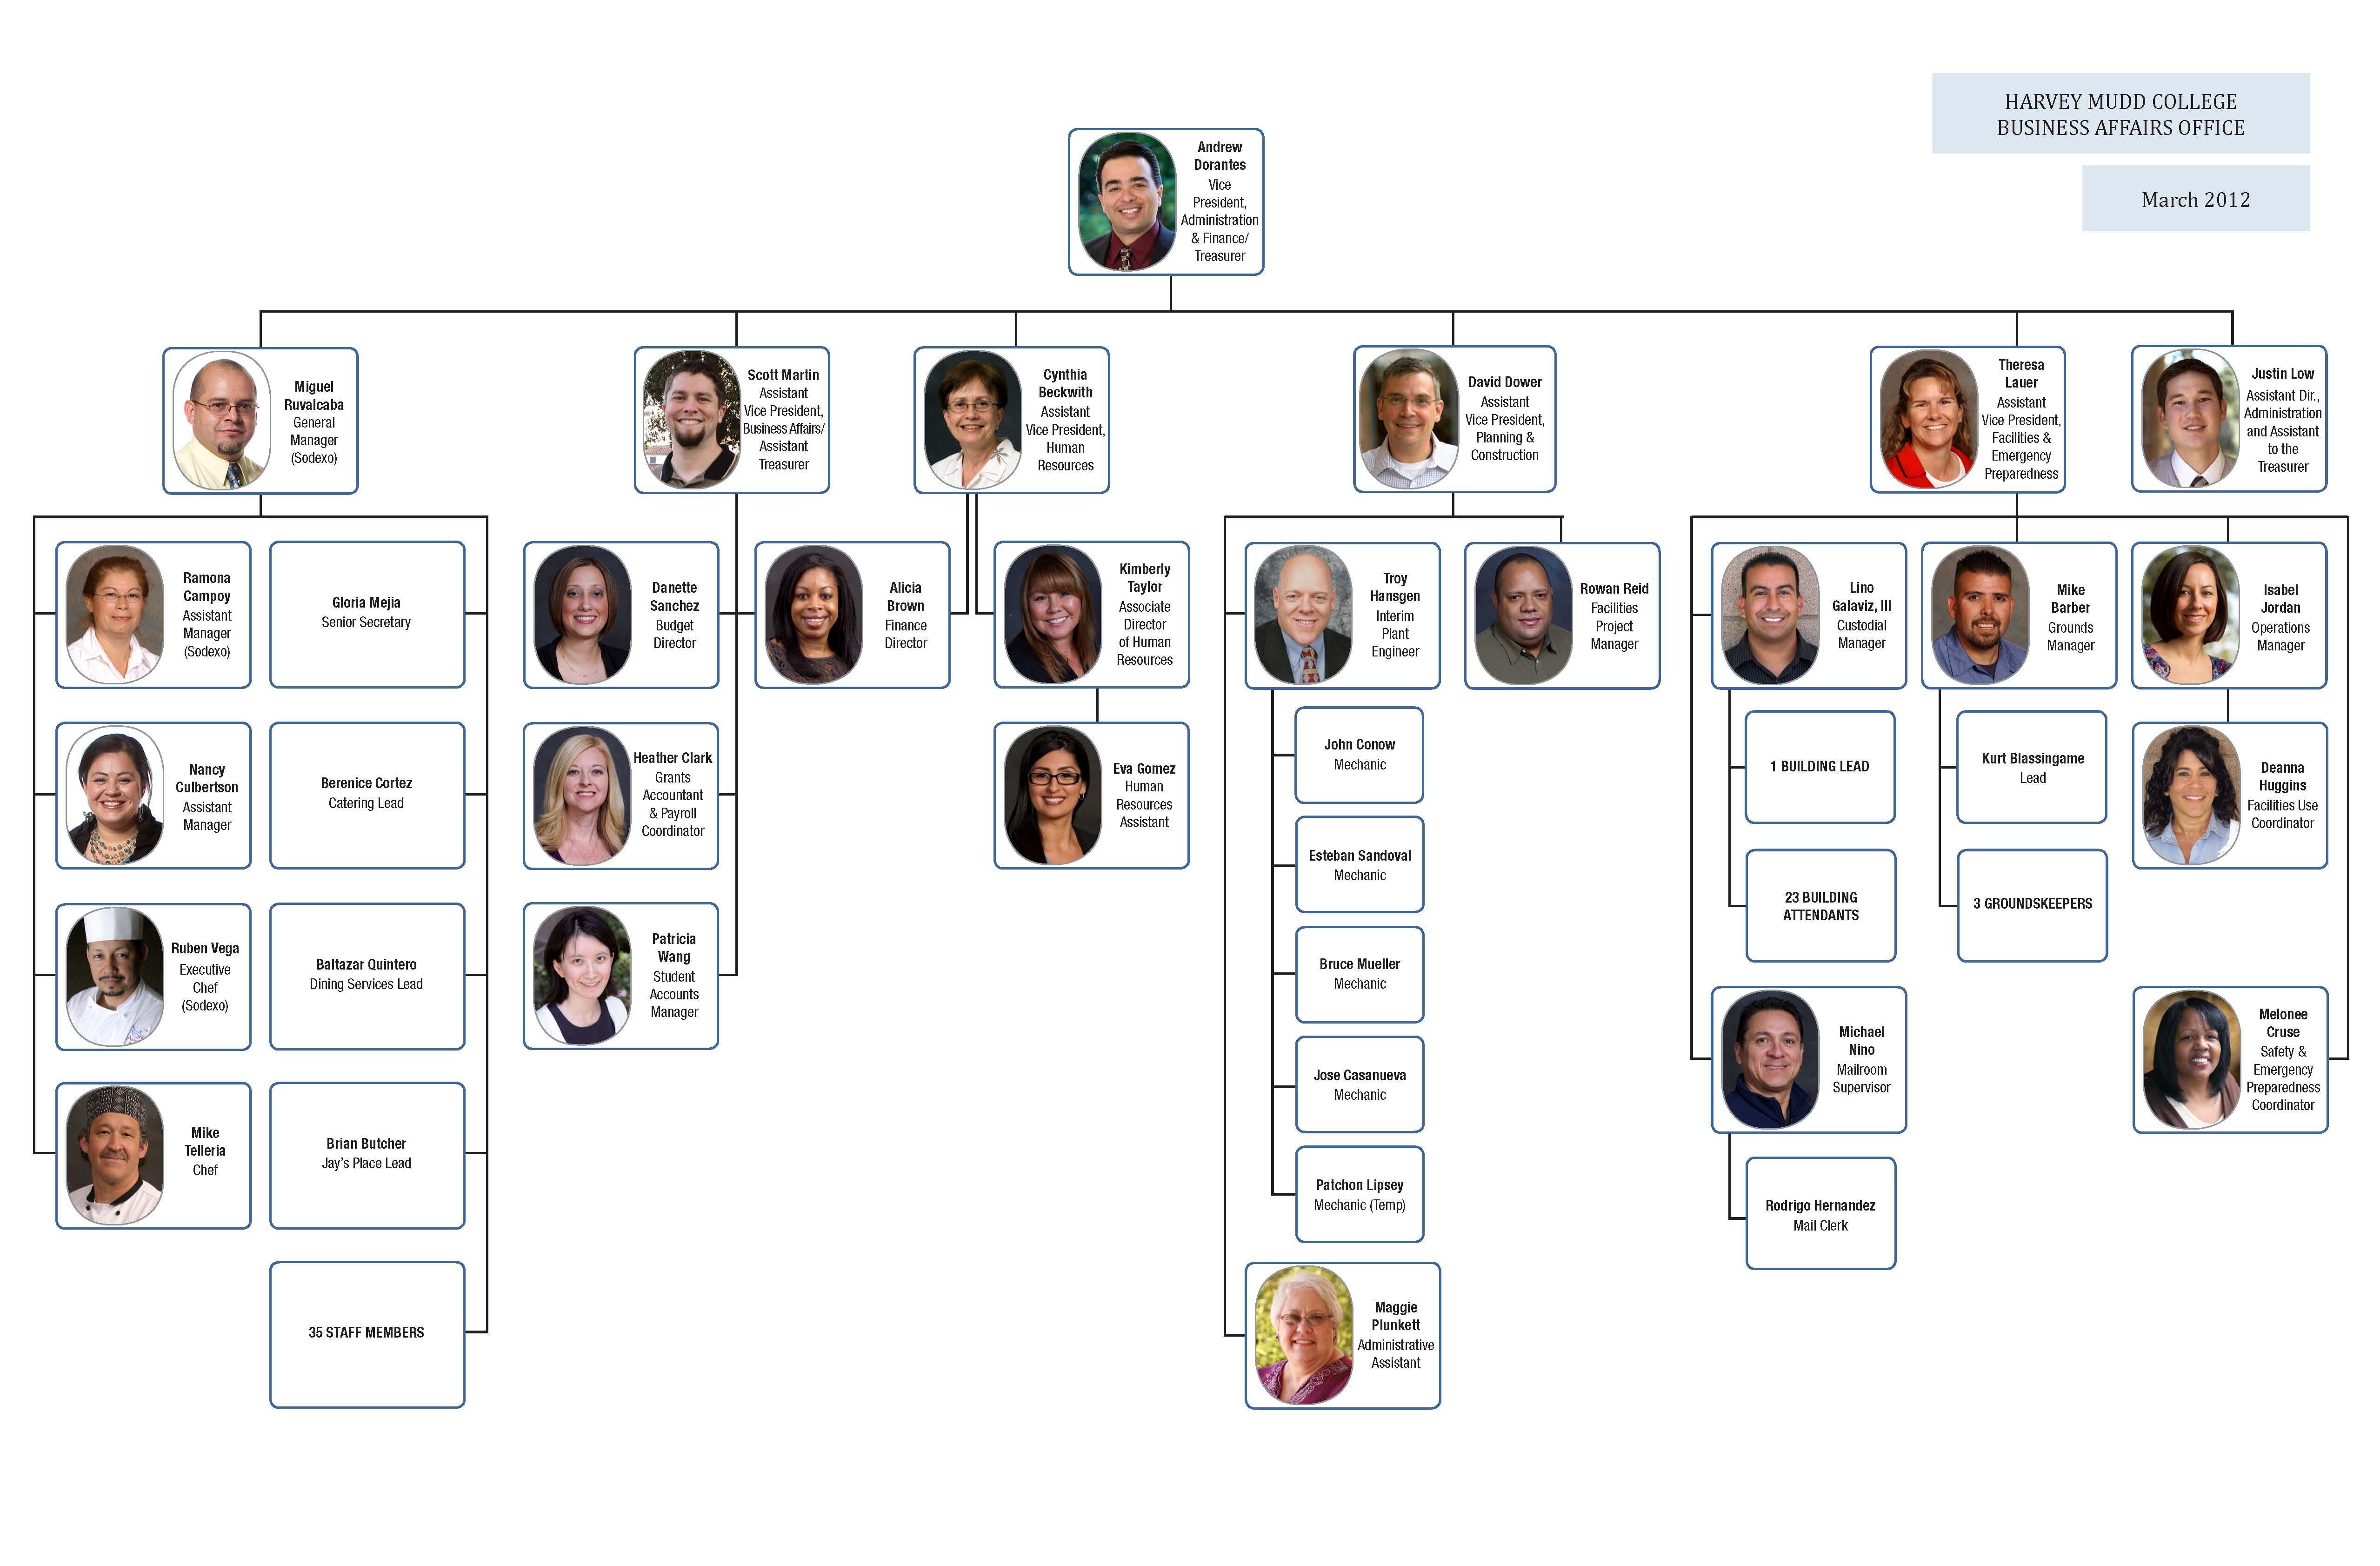 Organizational Chart Http Www5 Hmc Edu Baonews Wp